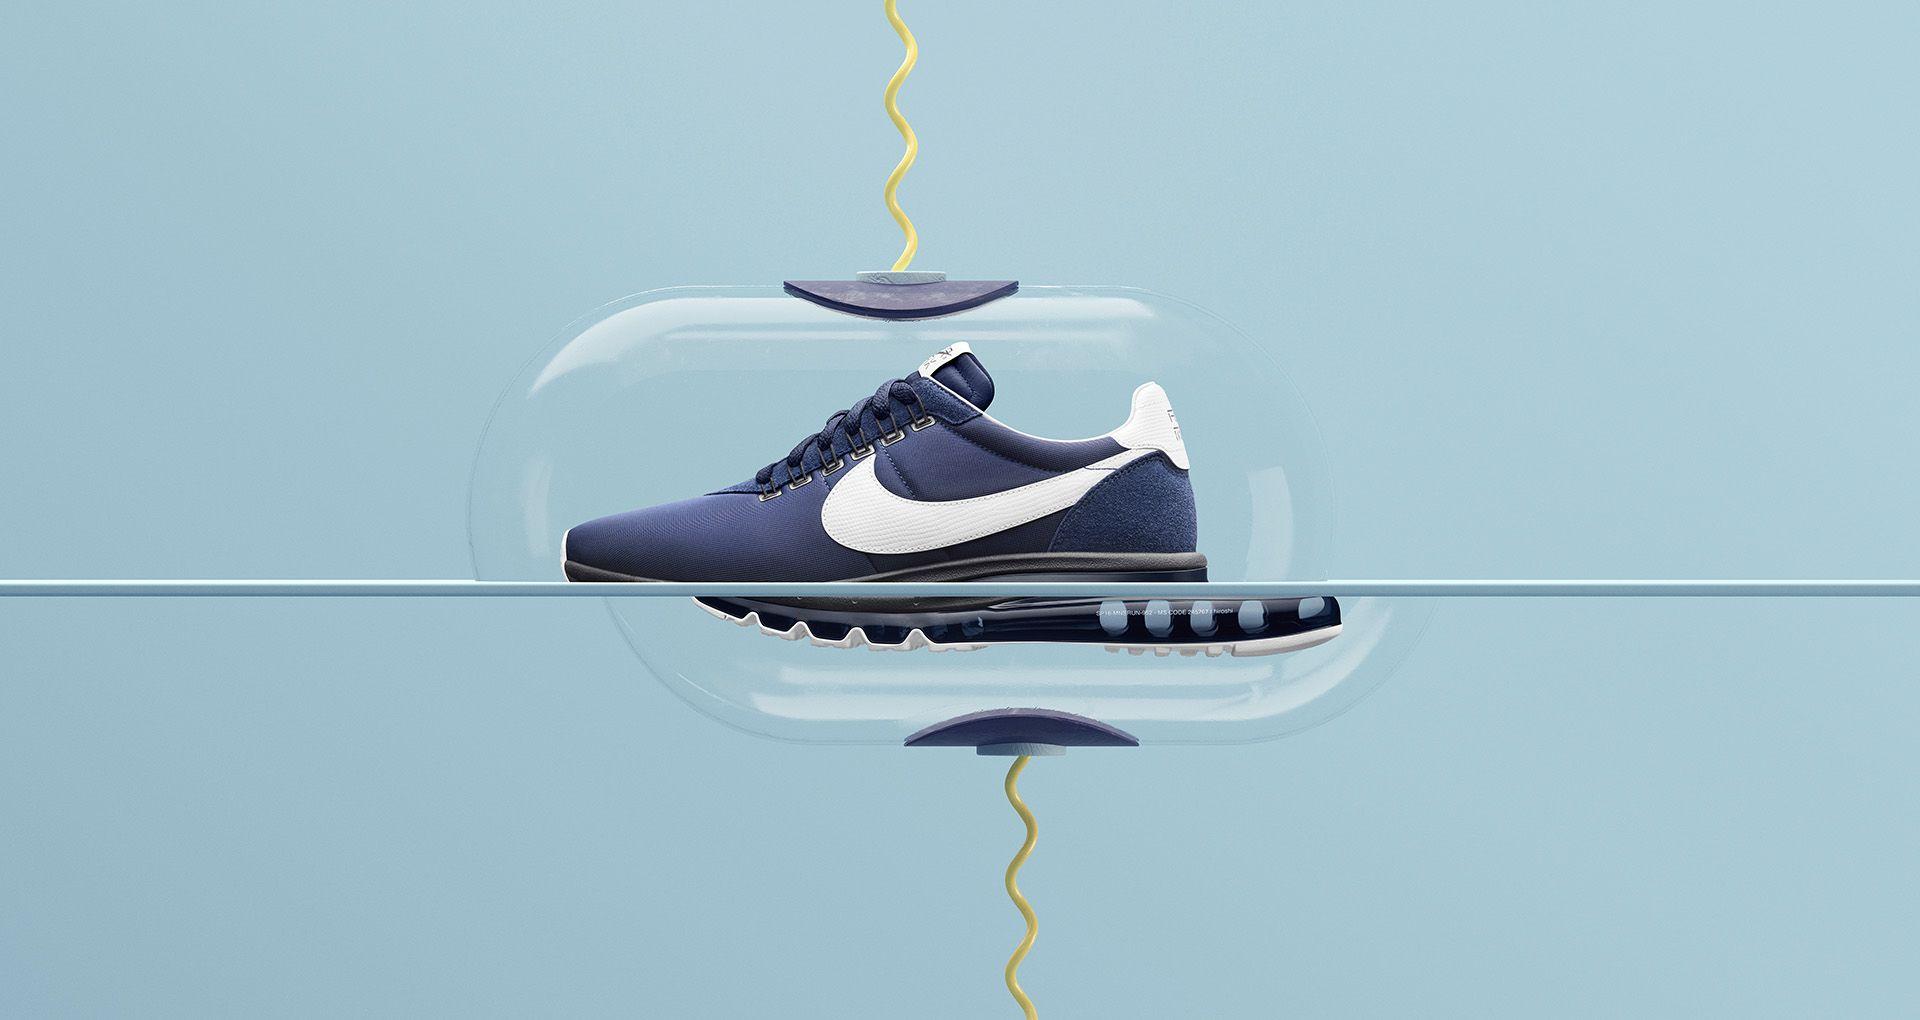 7909548eb9e5 Nike Air Max LD-Zero H  Hiroshi Fujiwara . Nike+ SNKRS